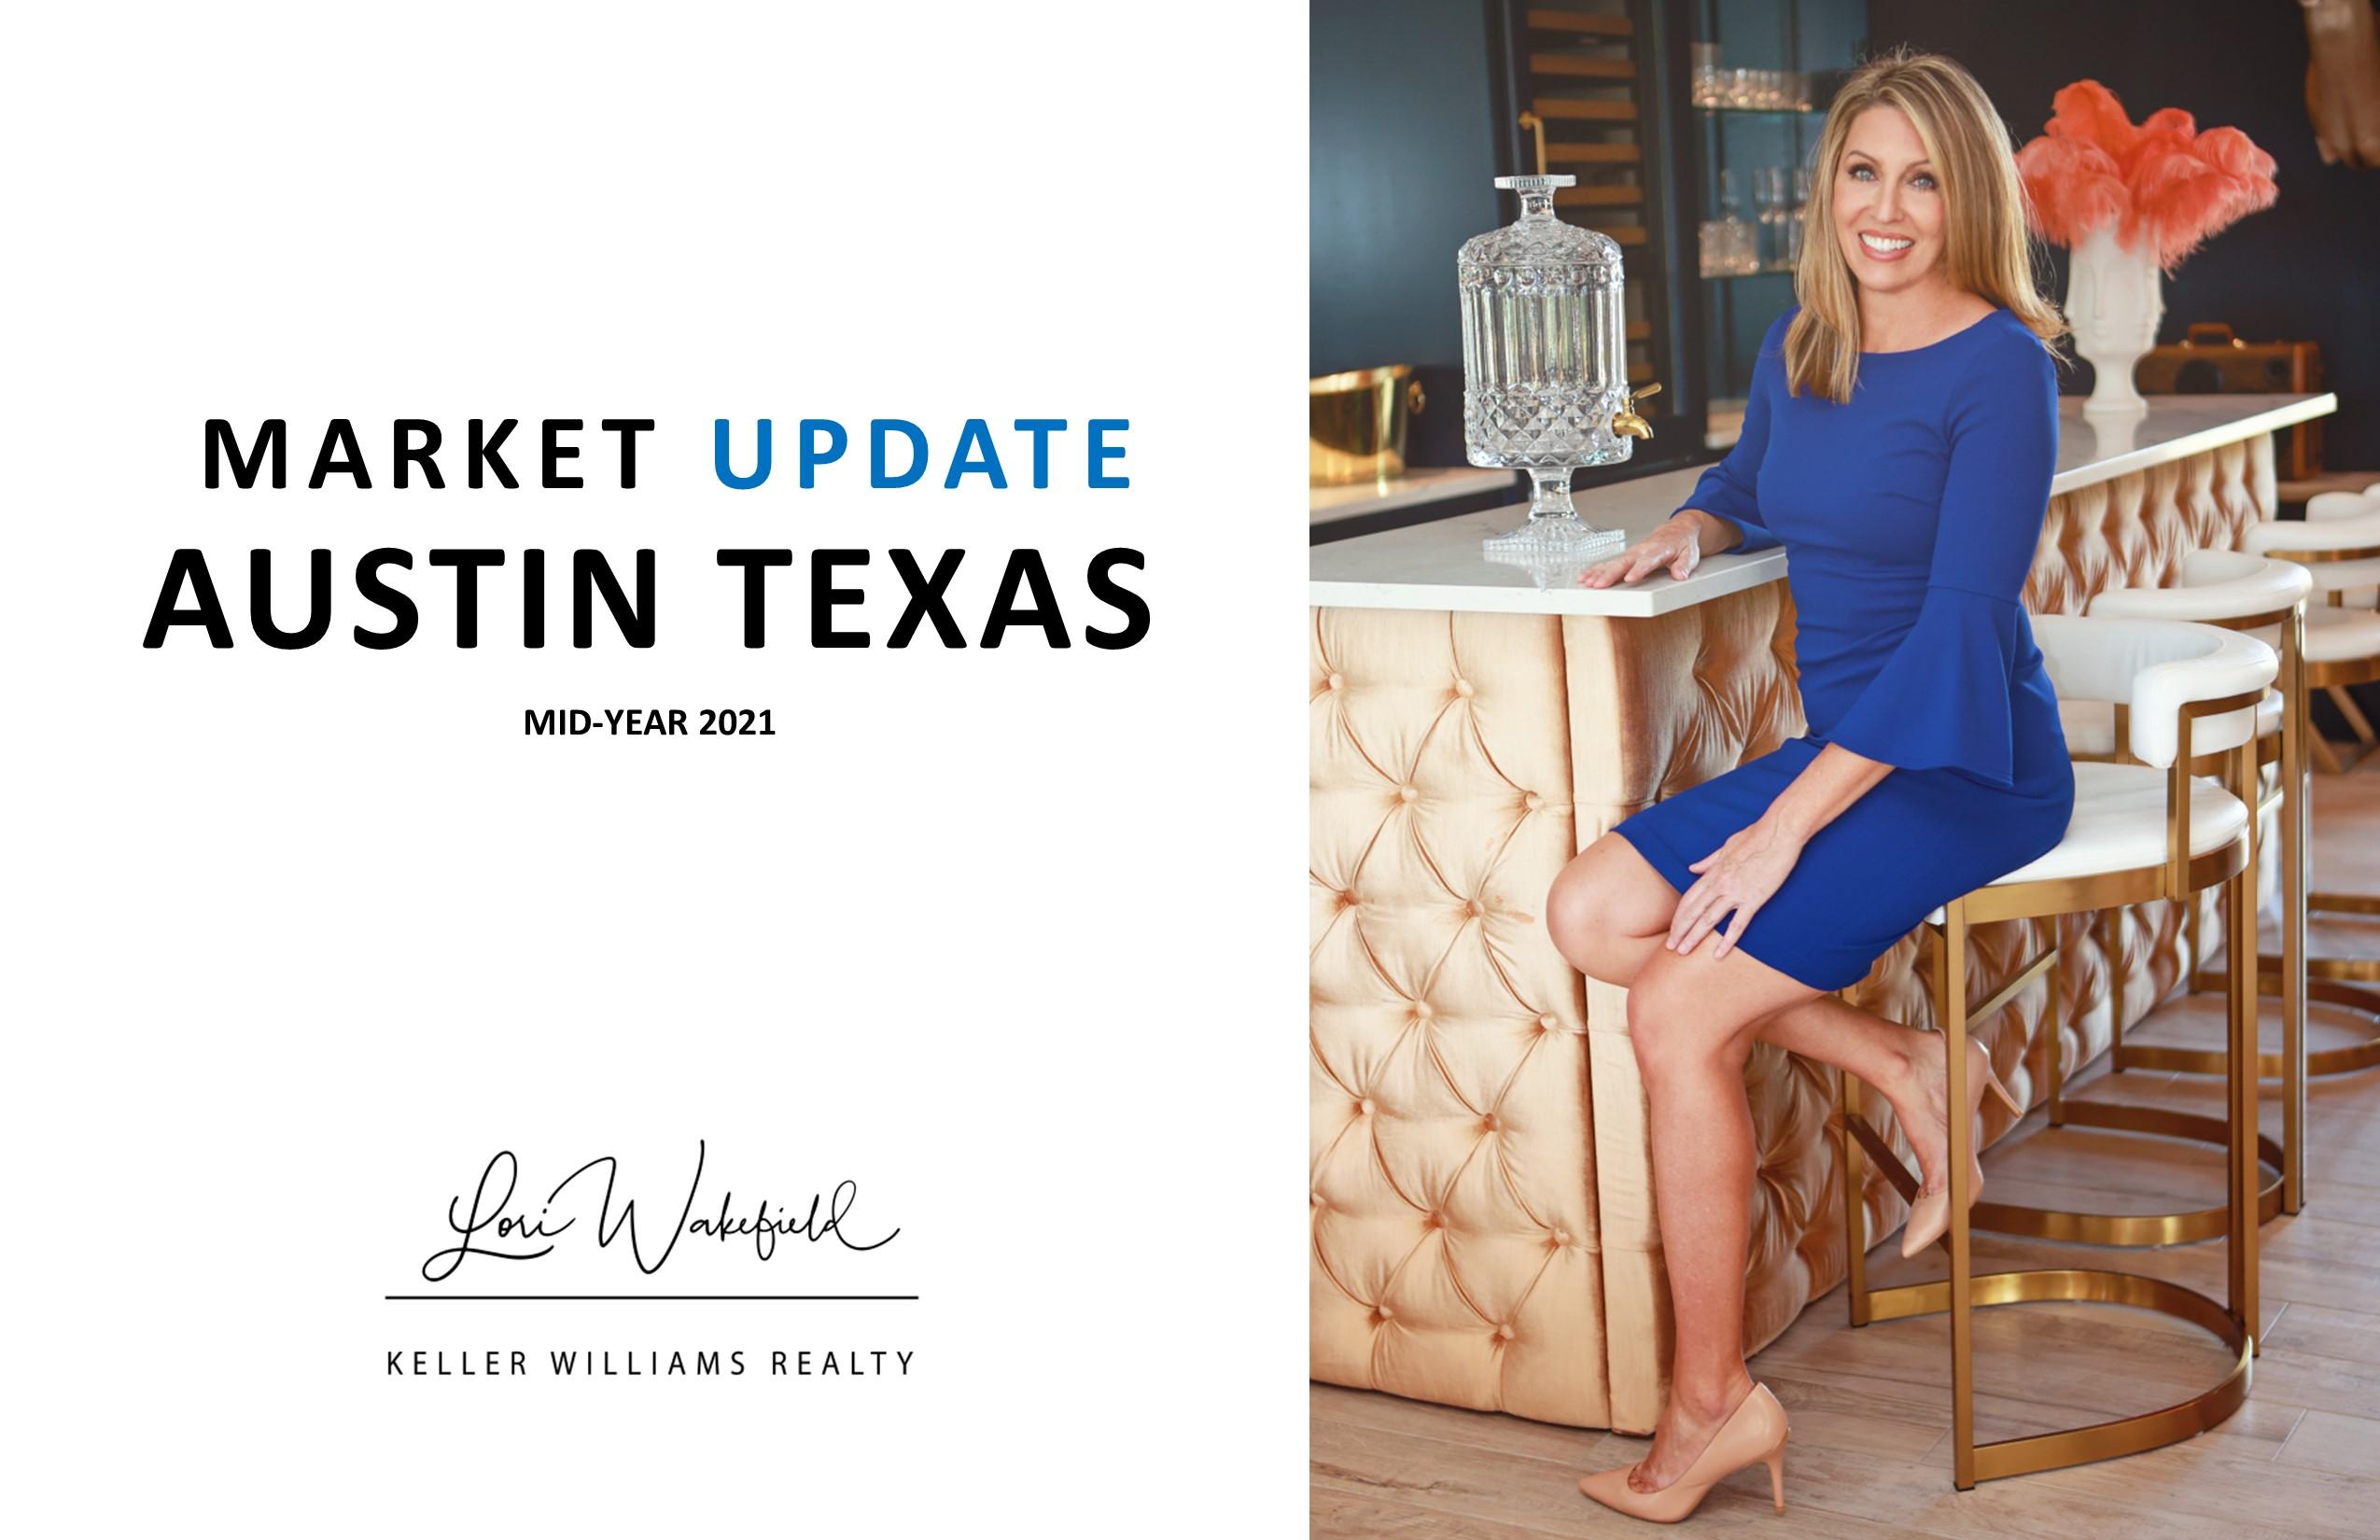 Lori Wakefield REALTOR   Keller Williams Realty Austin Texas   512-657-4455